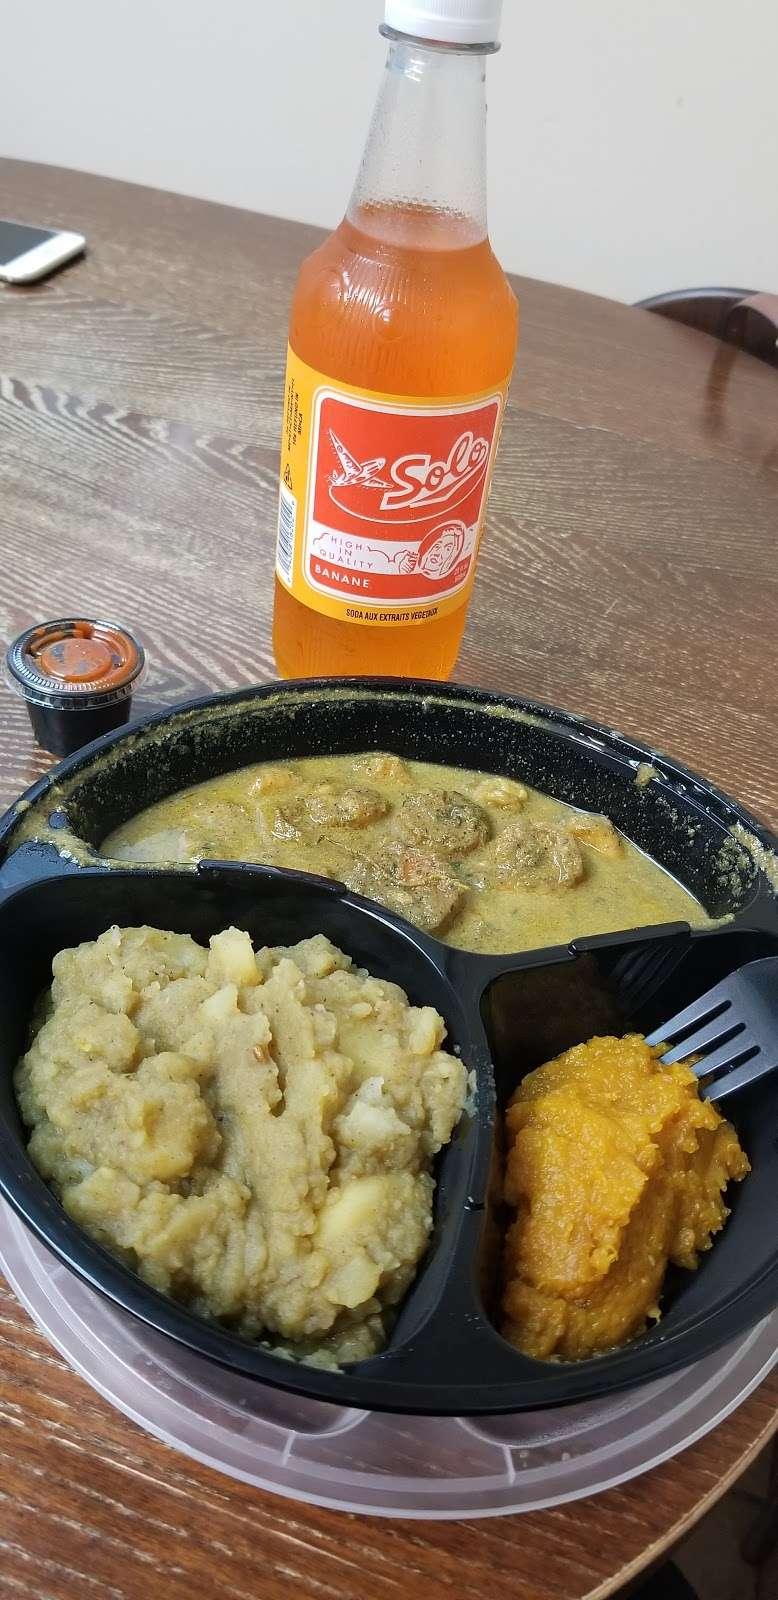 Tabanka Trini Restaurant - restaurant  | Photo 2 of 8 | Address: 1645 South State Road 7, North Lauderdale, FL 33068, USA | Phone: (954) 933-1307